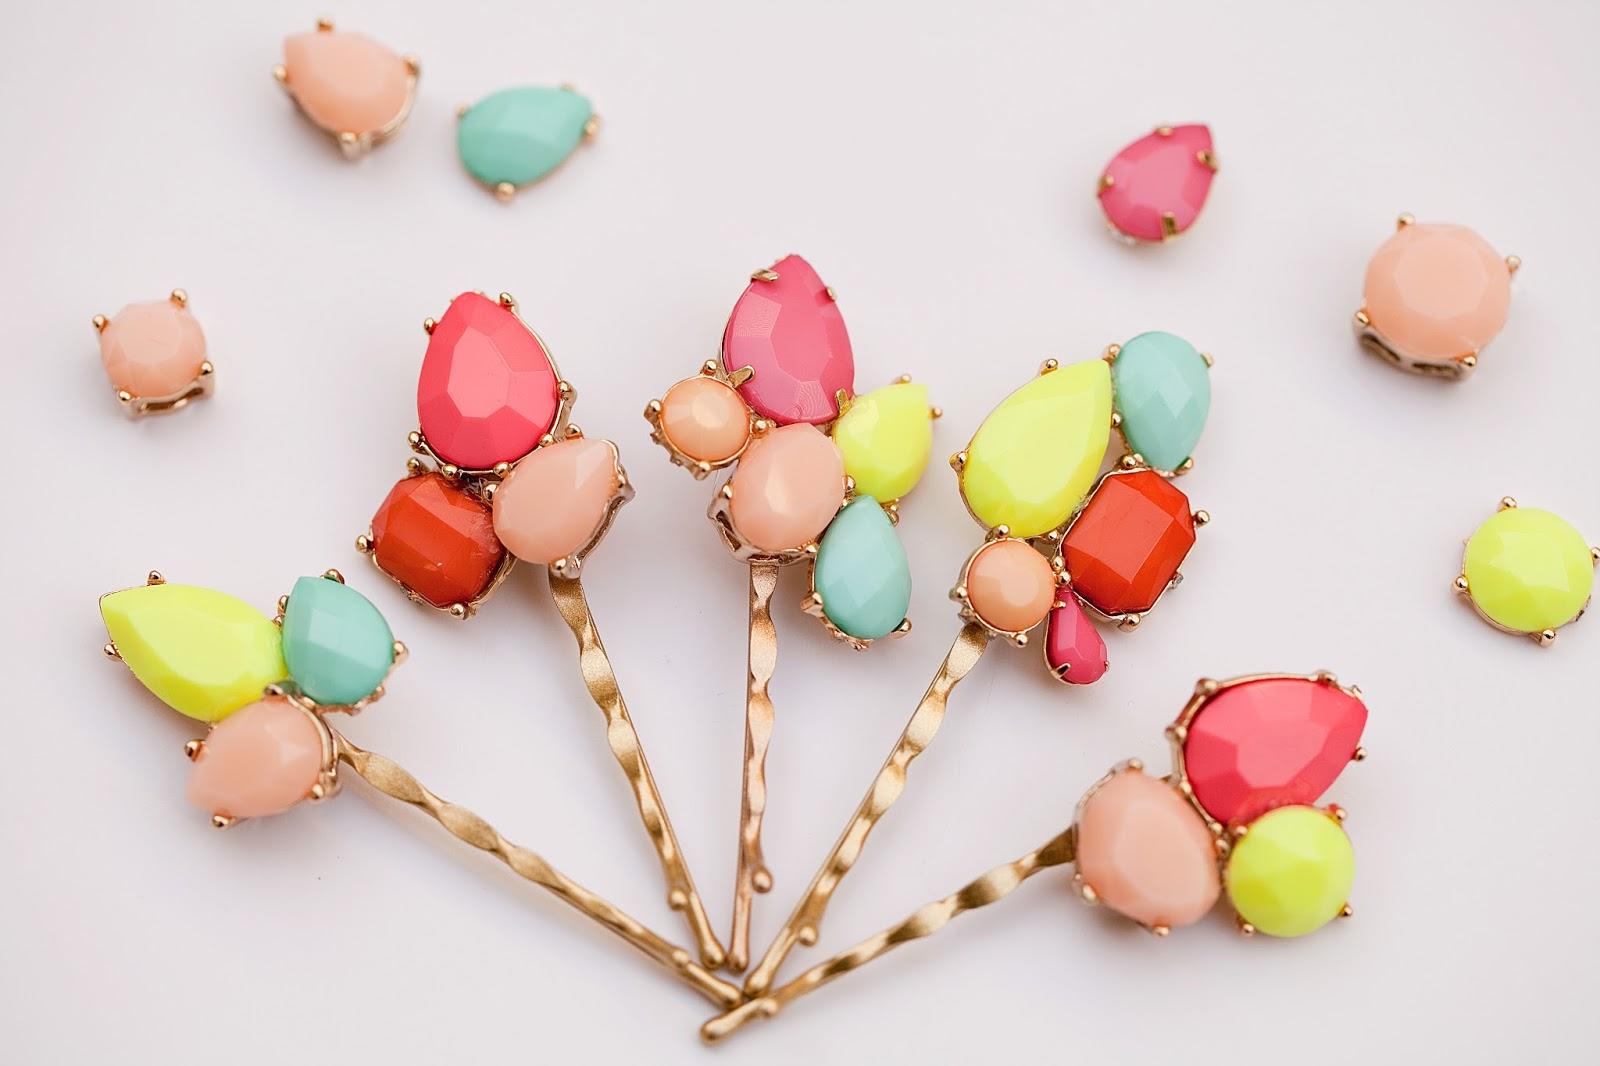 gemstone bobby pins, a craft that makes money